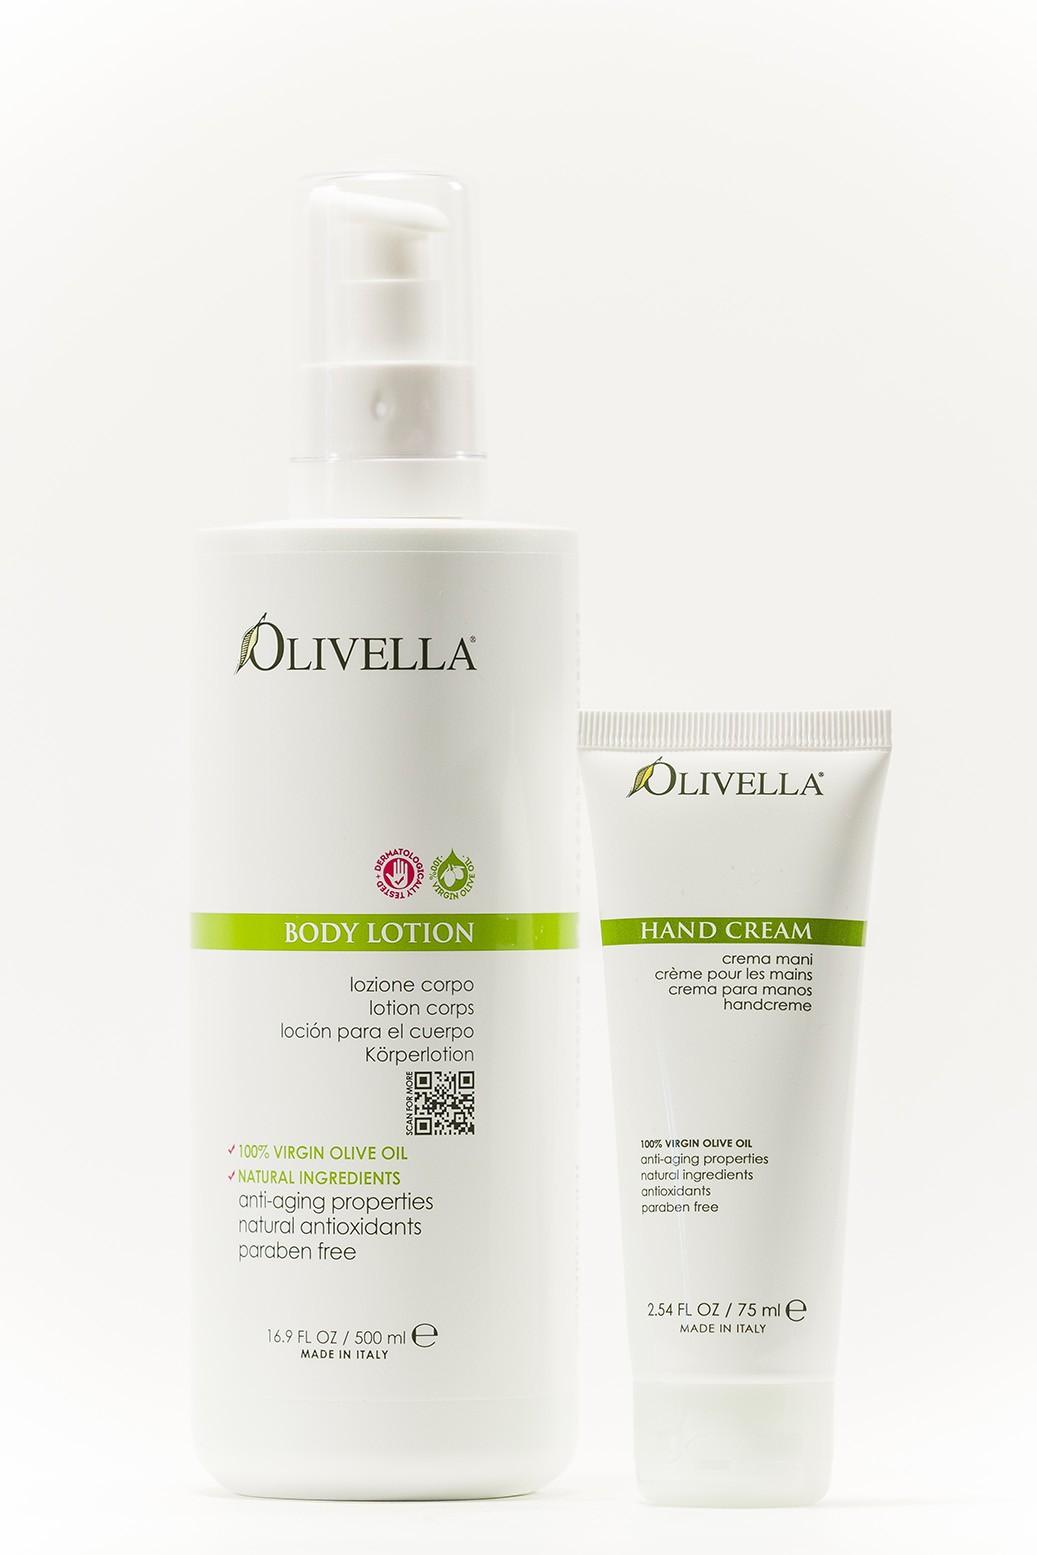 Olivella Body Lotion